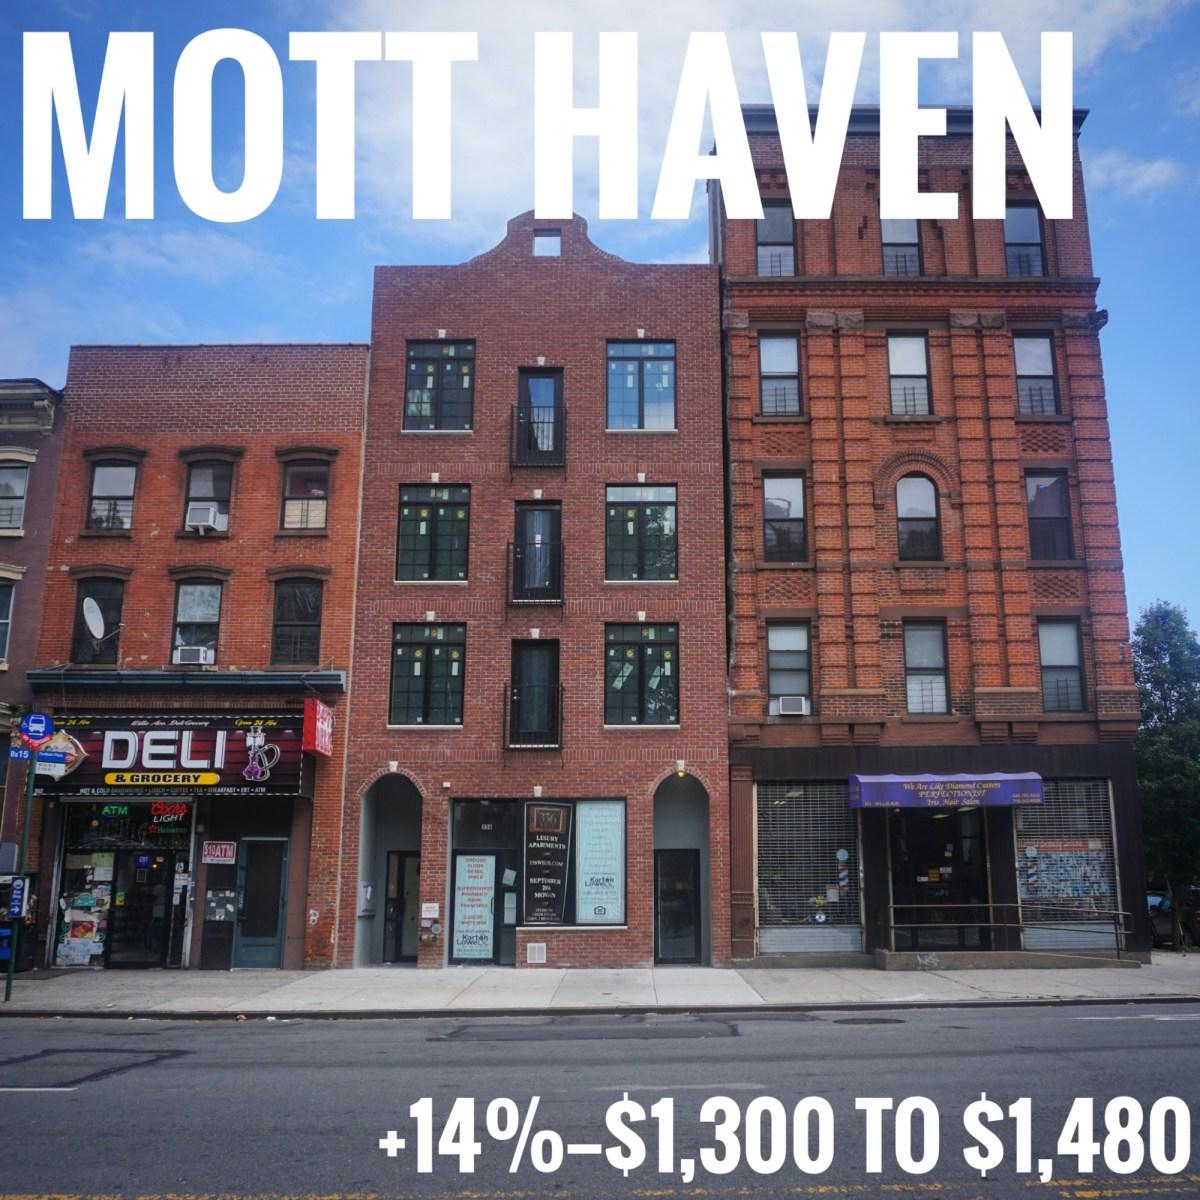 1 Bedroom Nyc: South Bronx Sees Biggest Increase In 1 Bedroom Rents In